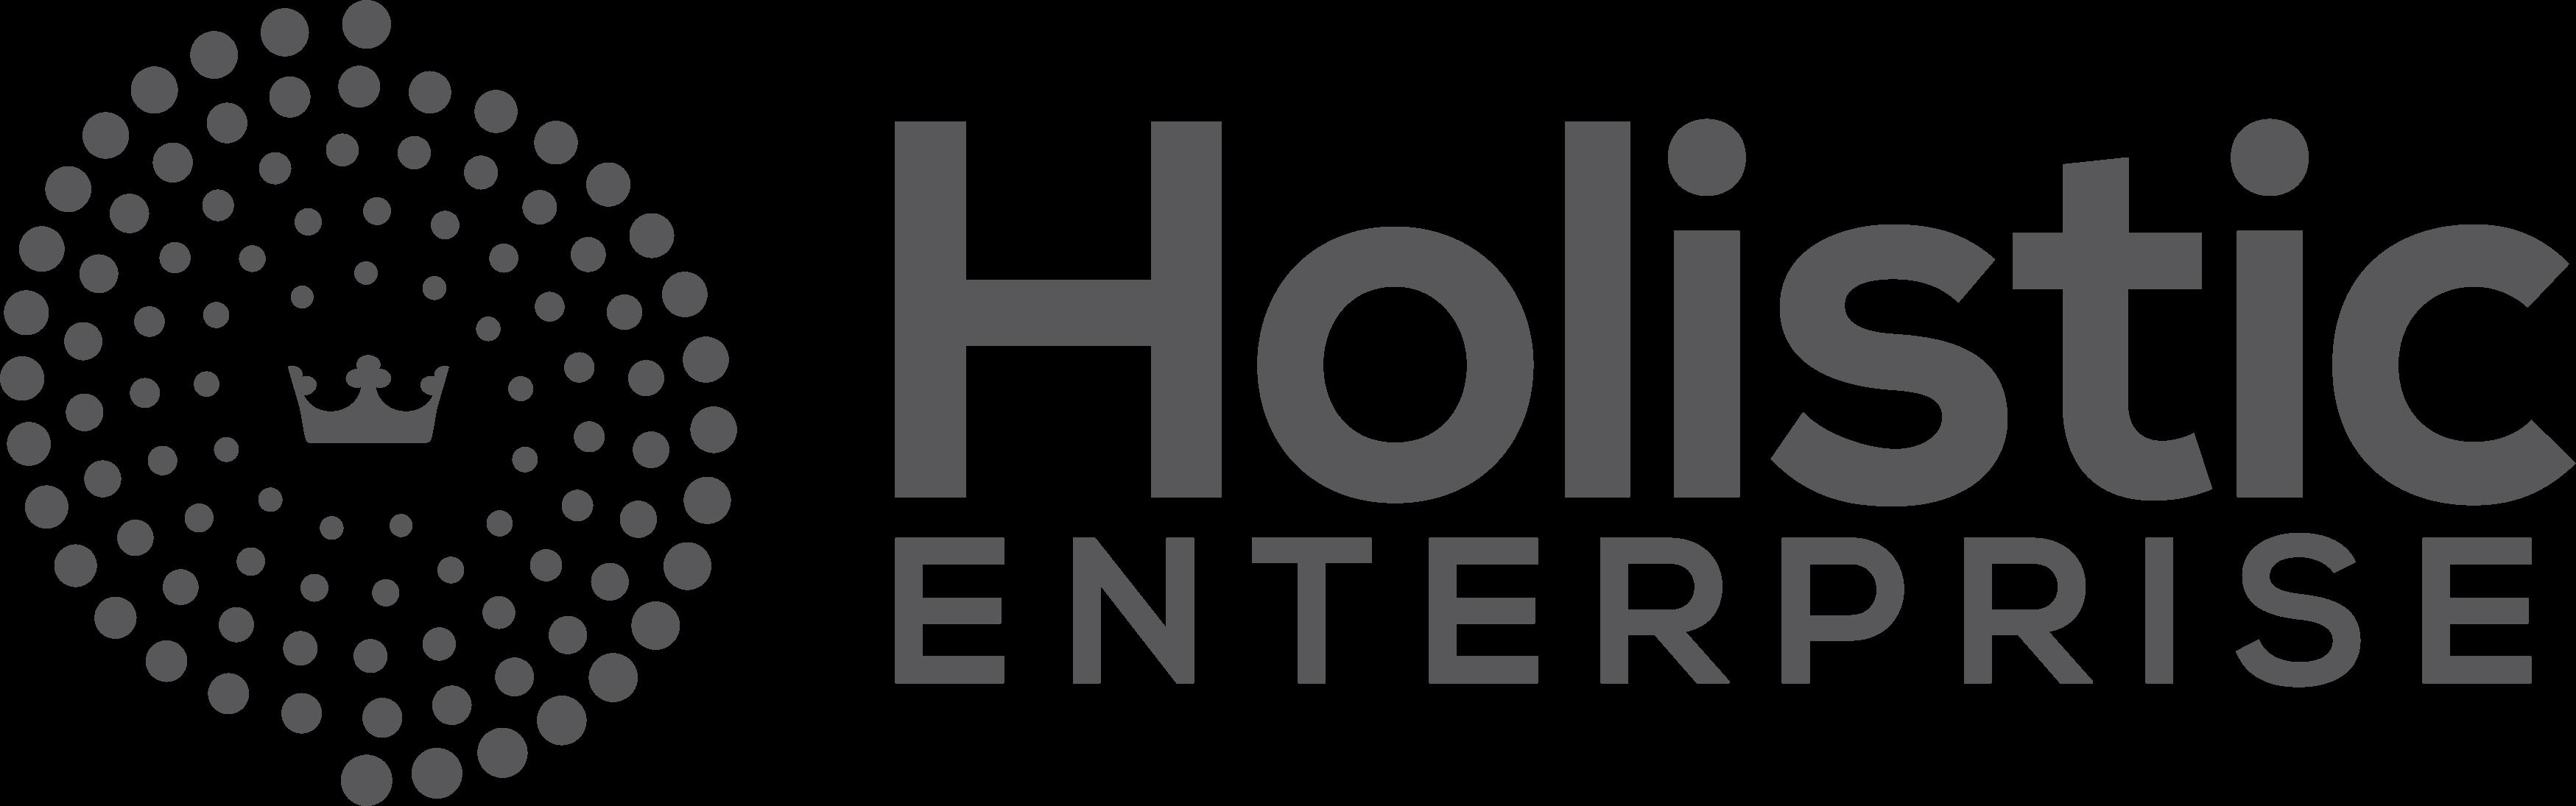 Holistic Enterprise